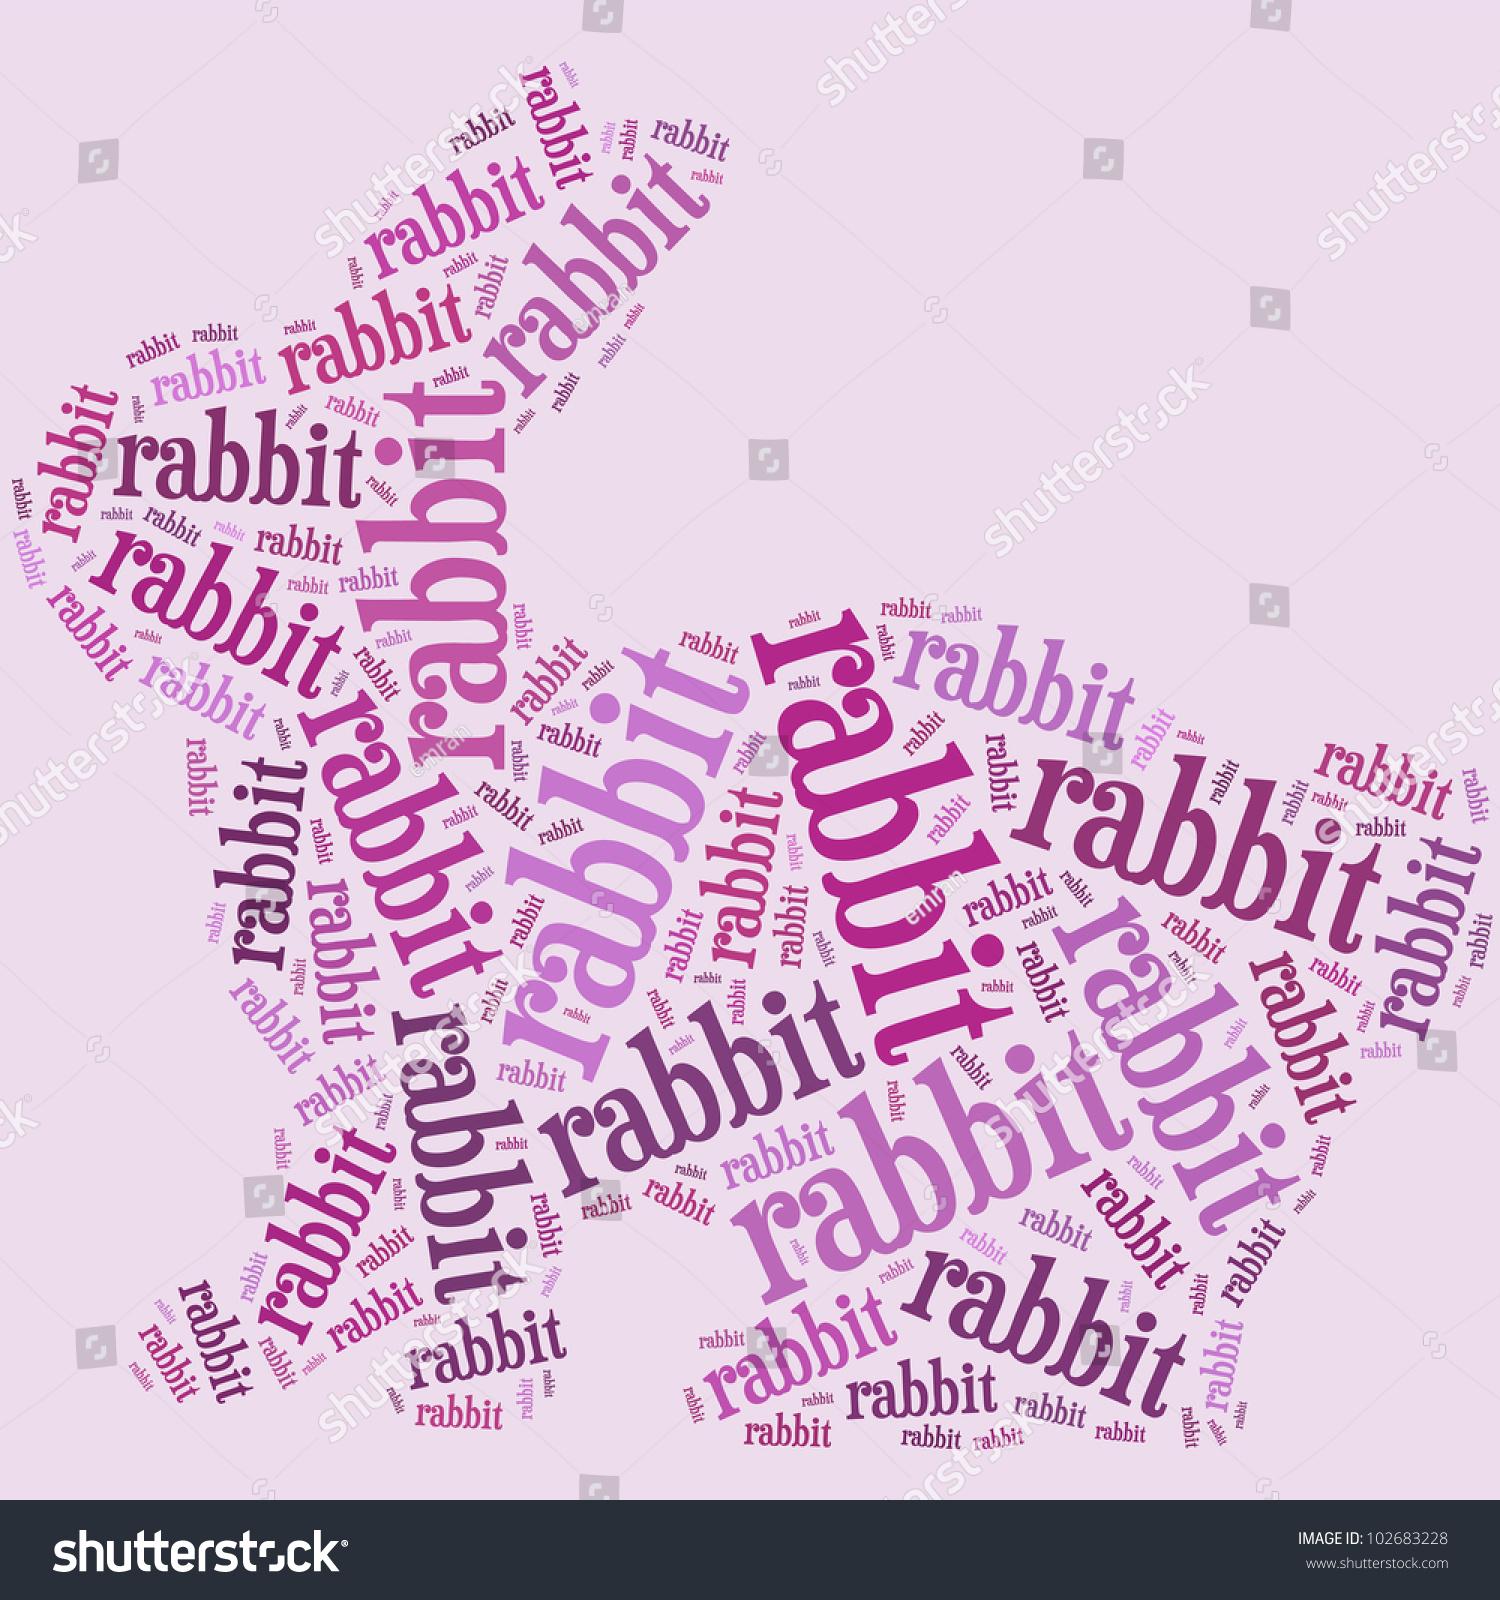 rabbit word cloud composed shape rabbit stock illustration